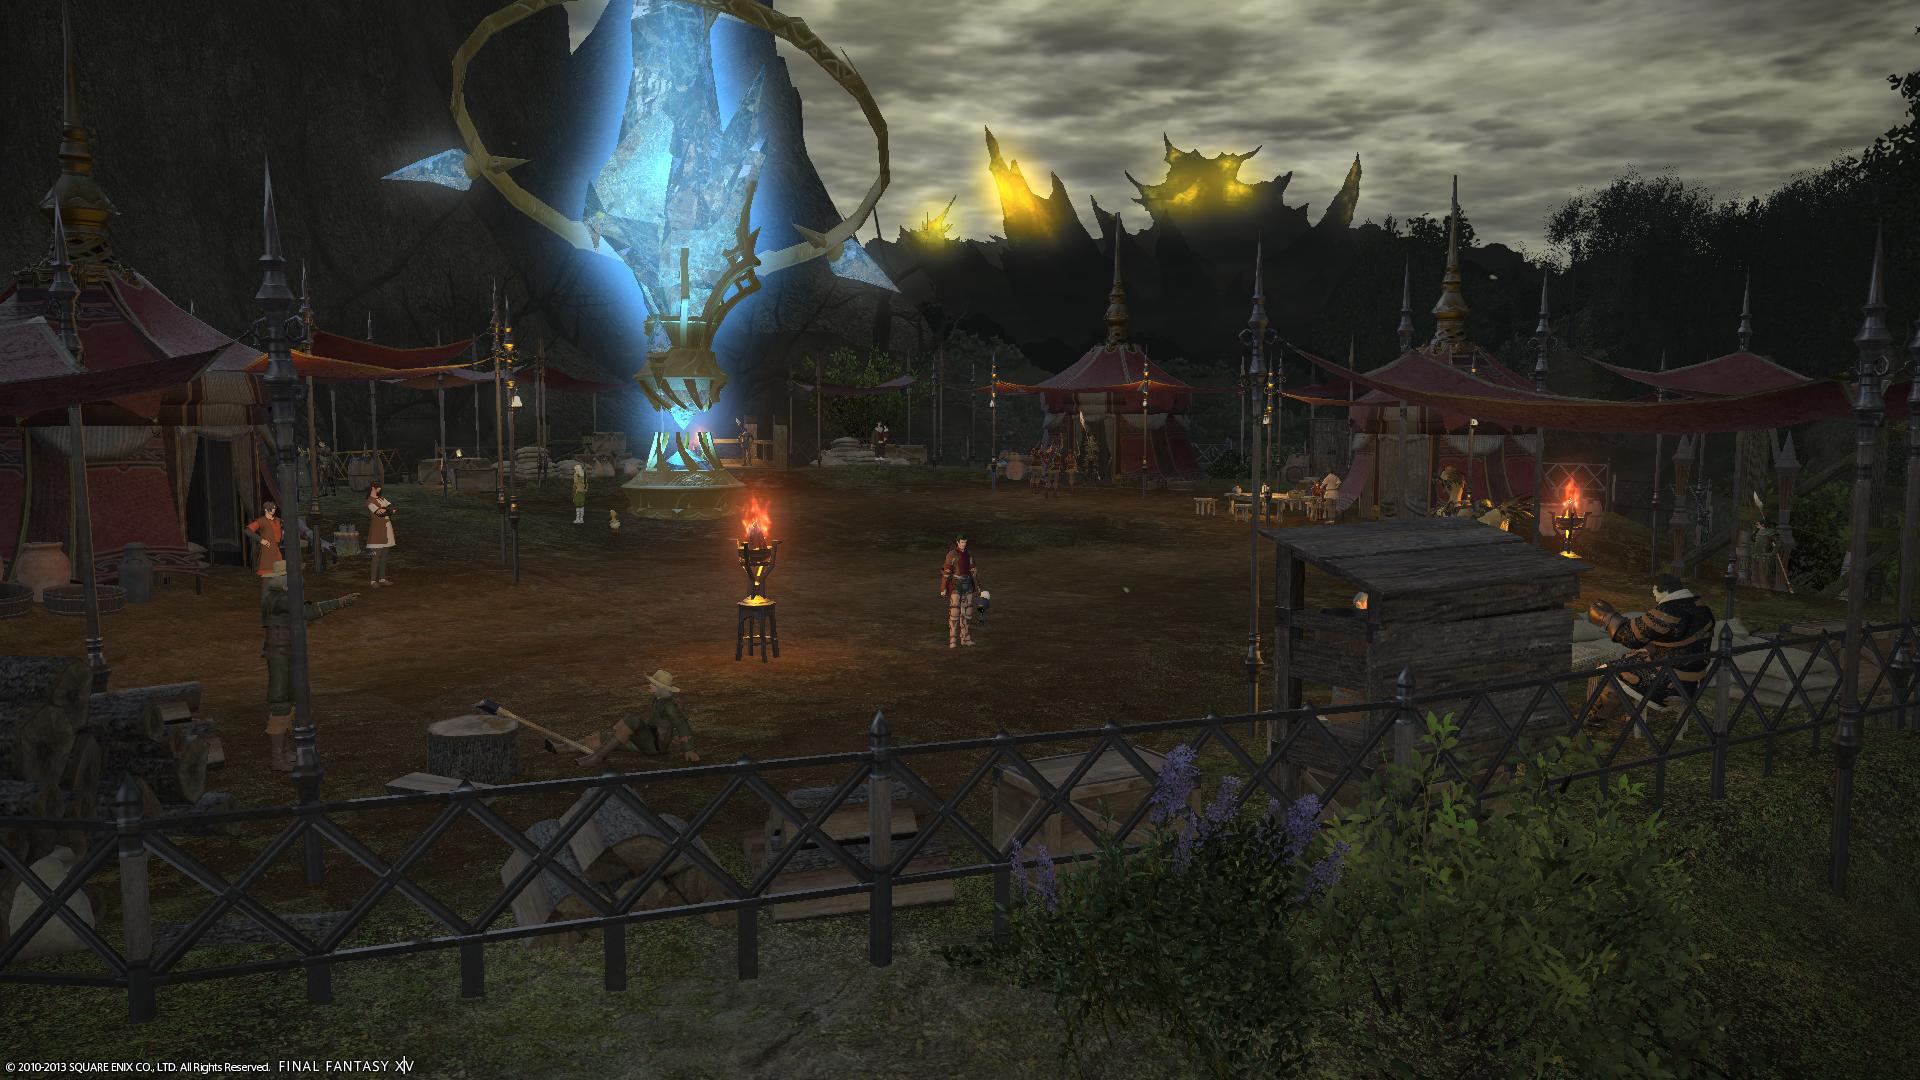 seiji okita ffxiv limsa through tonight well screenshots lifted phase beta